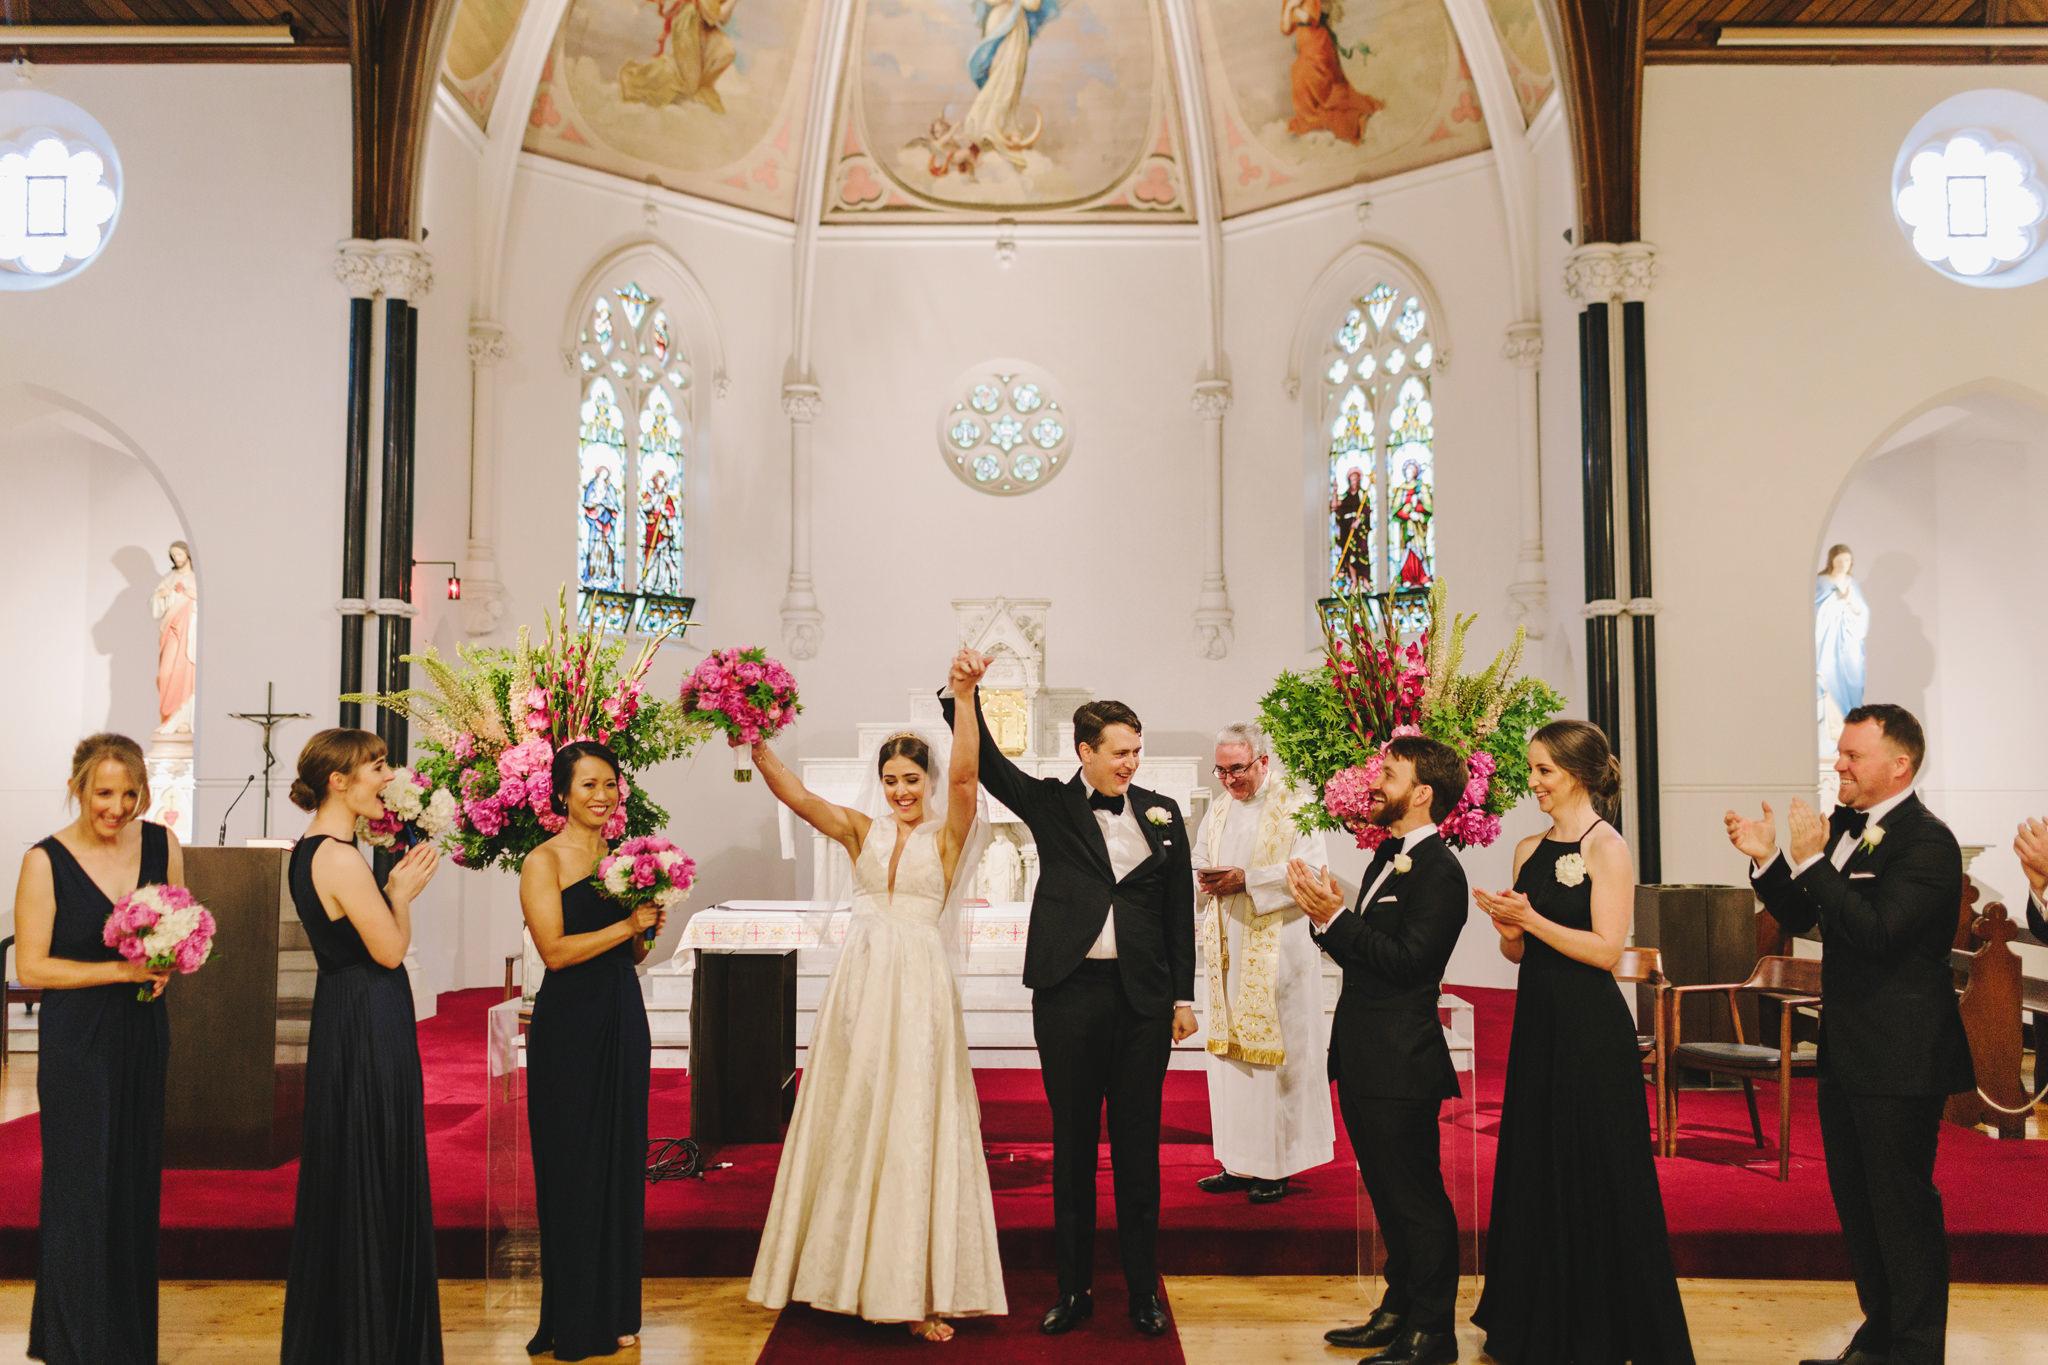 Abbotsford_Convent_Wedding_Peter_Anna069.JPG